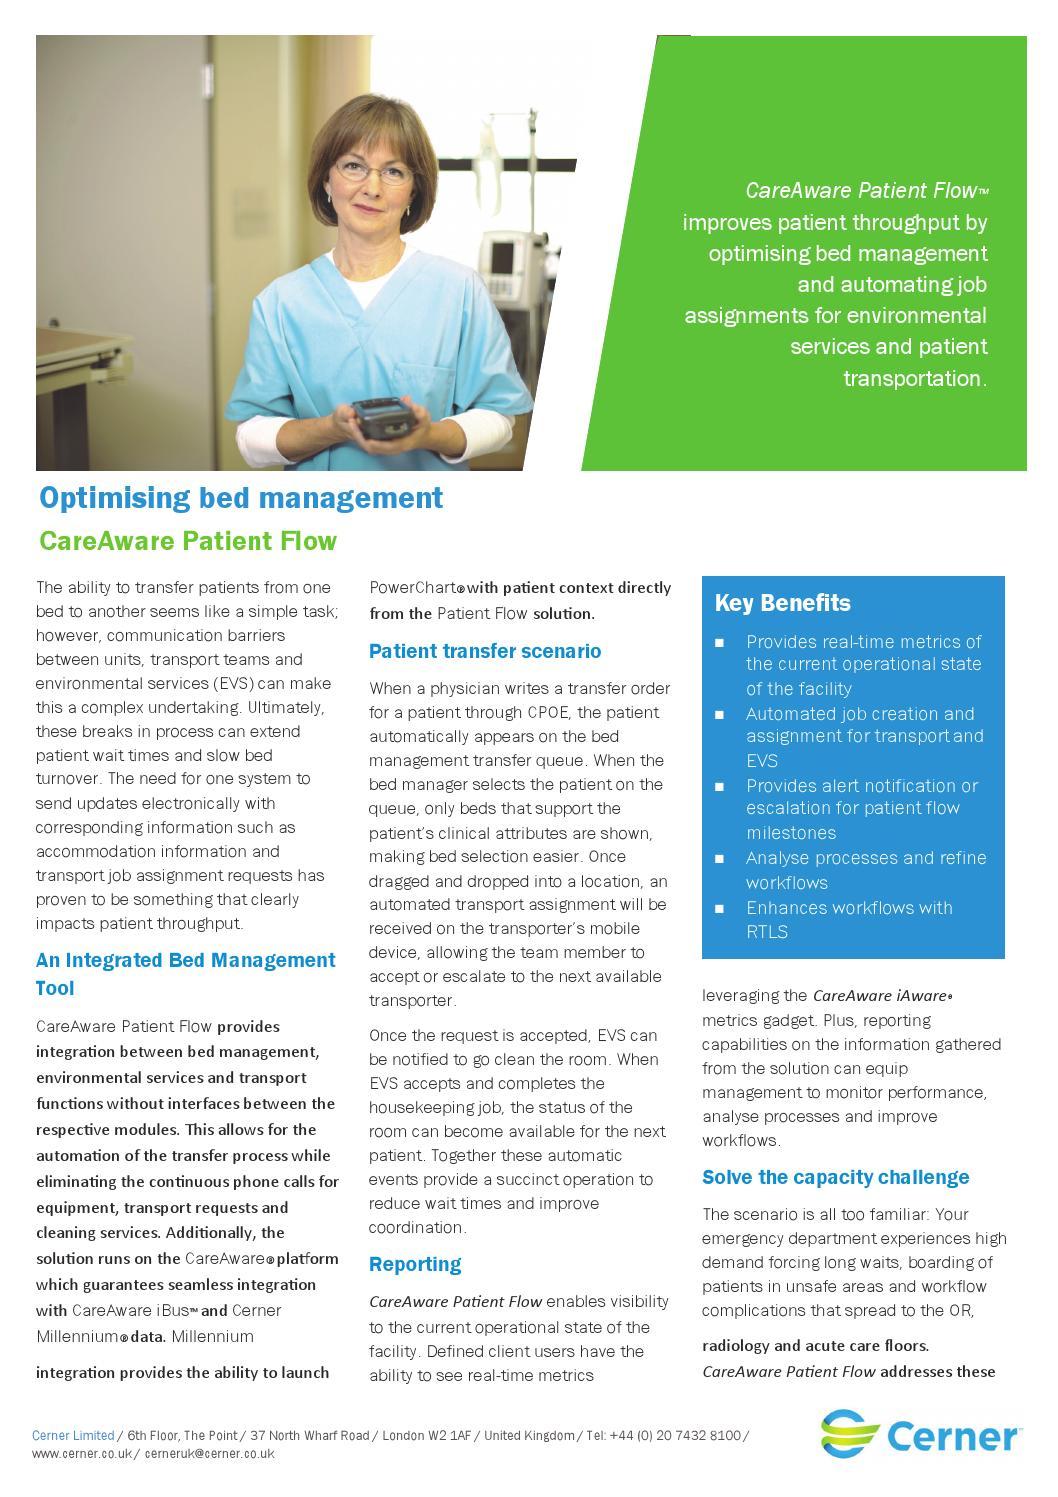 Optimising Bed Management: CareAware Patient Flow by Cerner